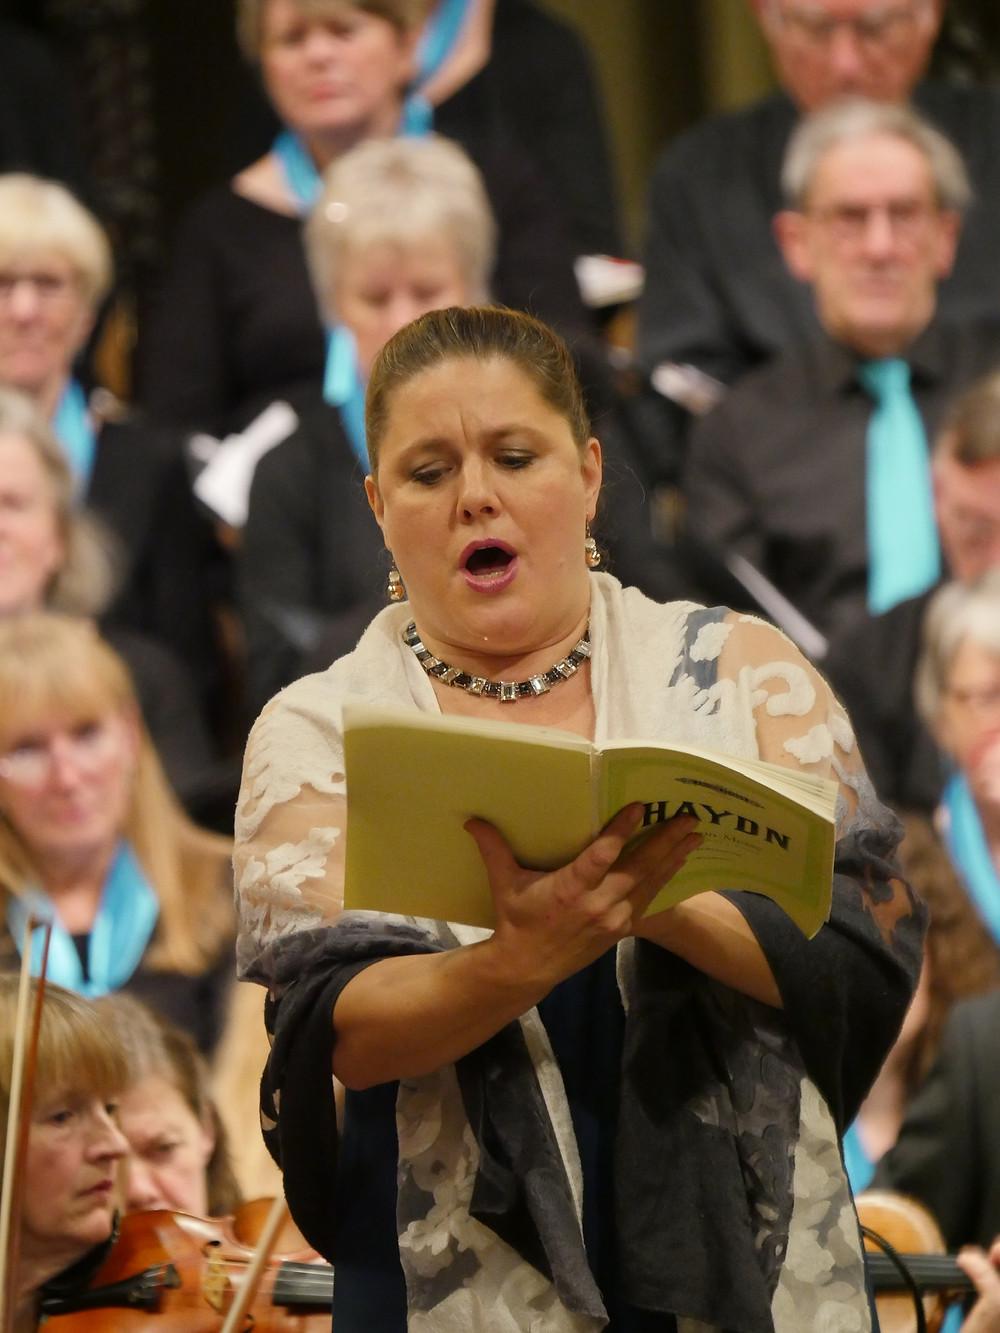 Alto soloist, Anna Burford